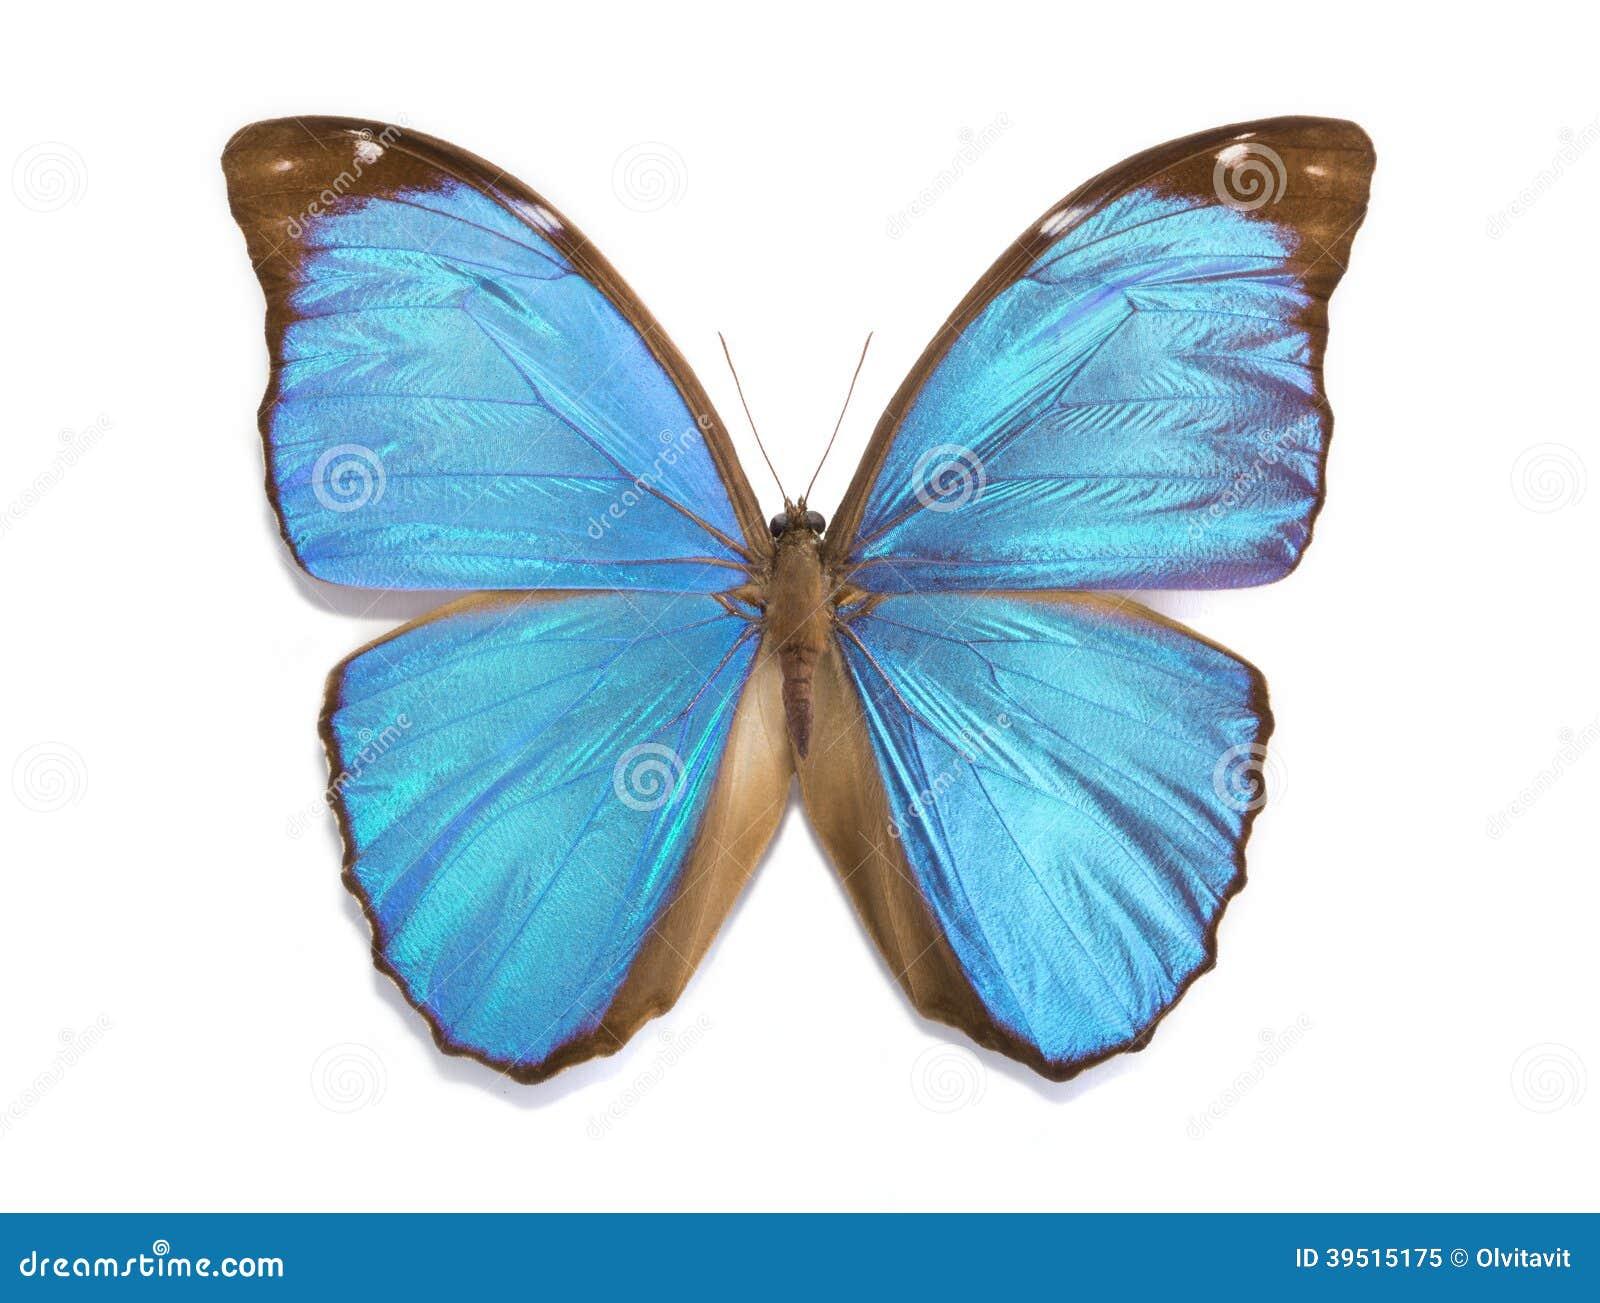 Tropical butterfly Morpho menelaus